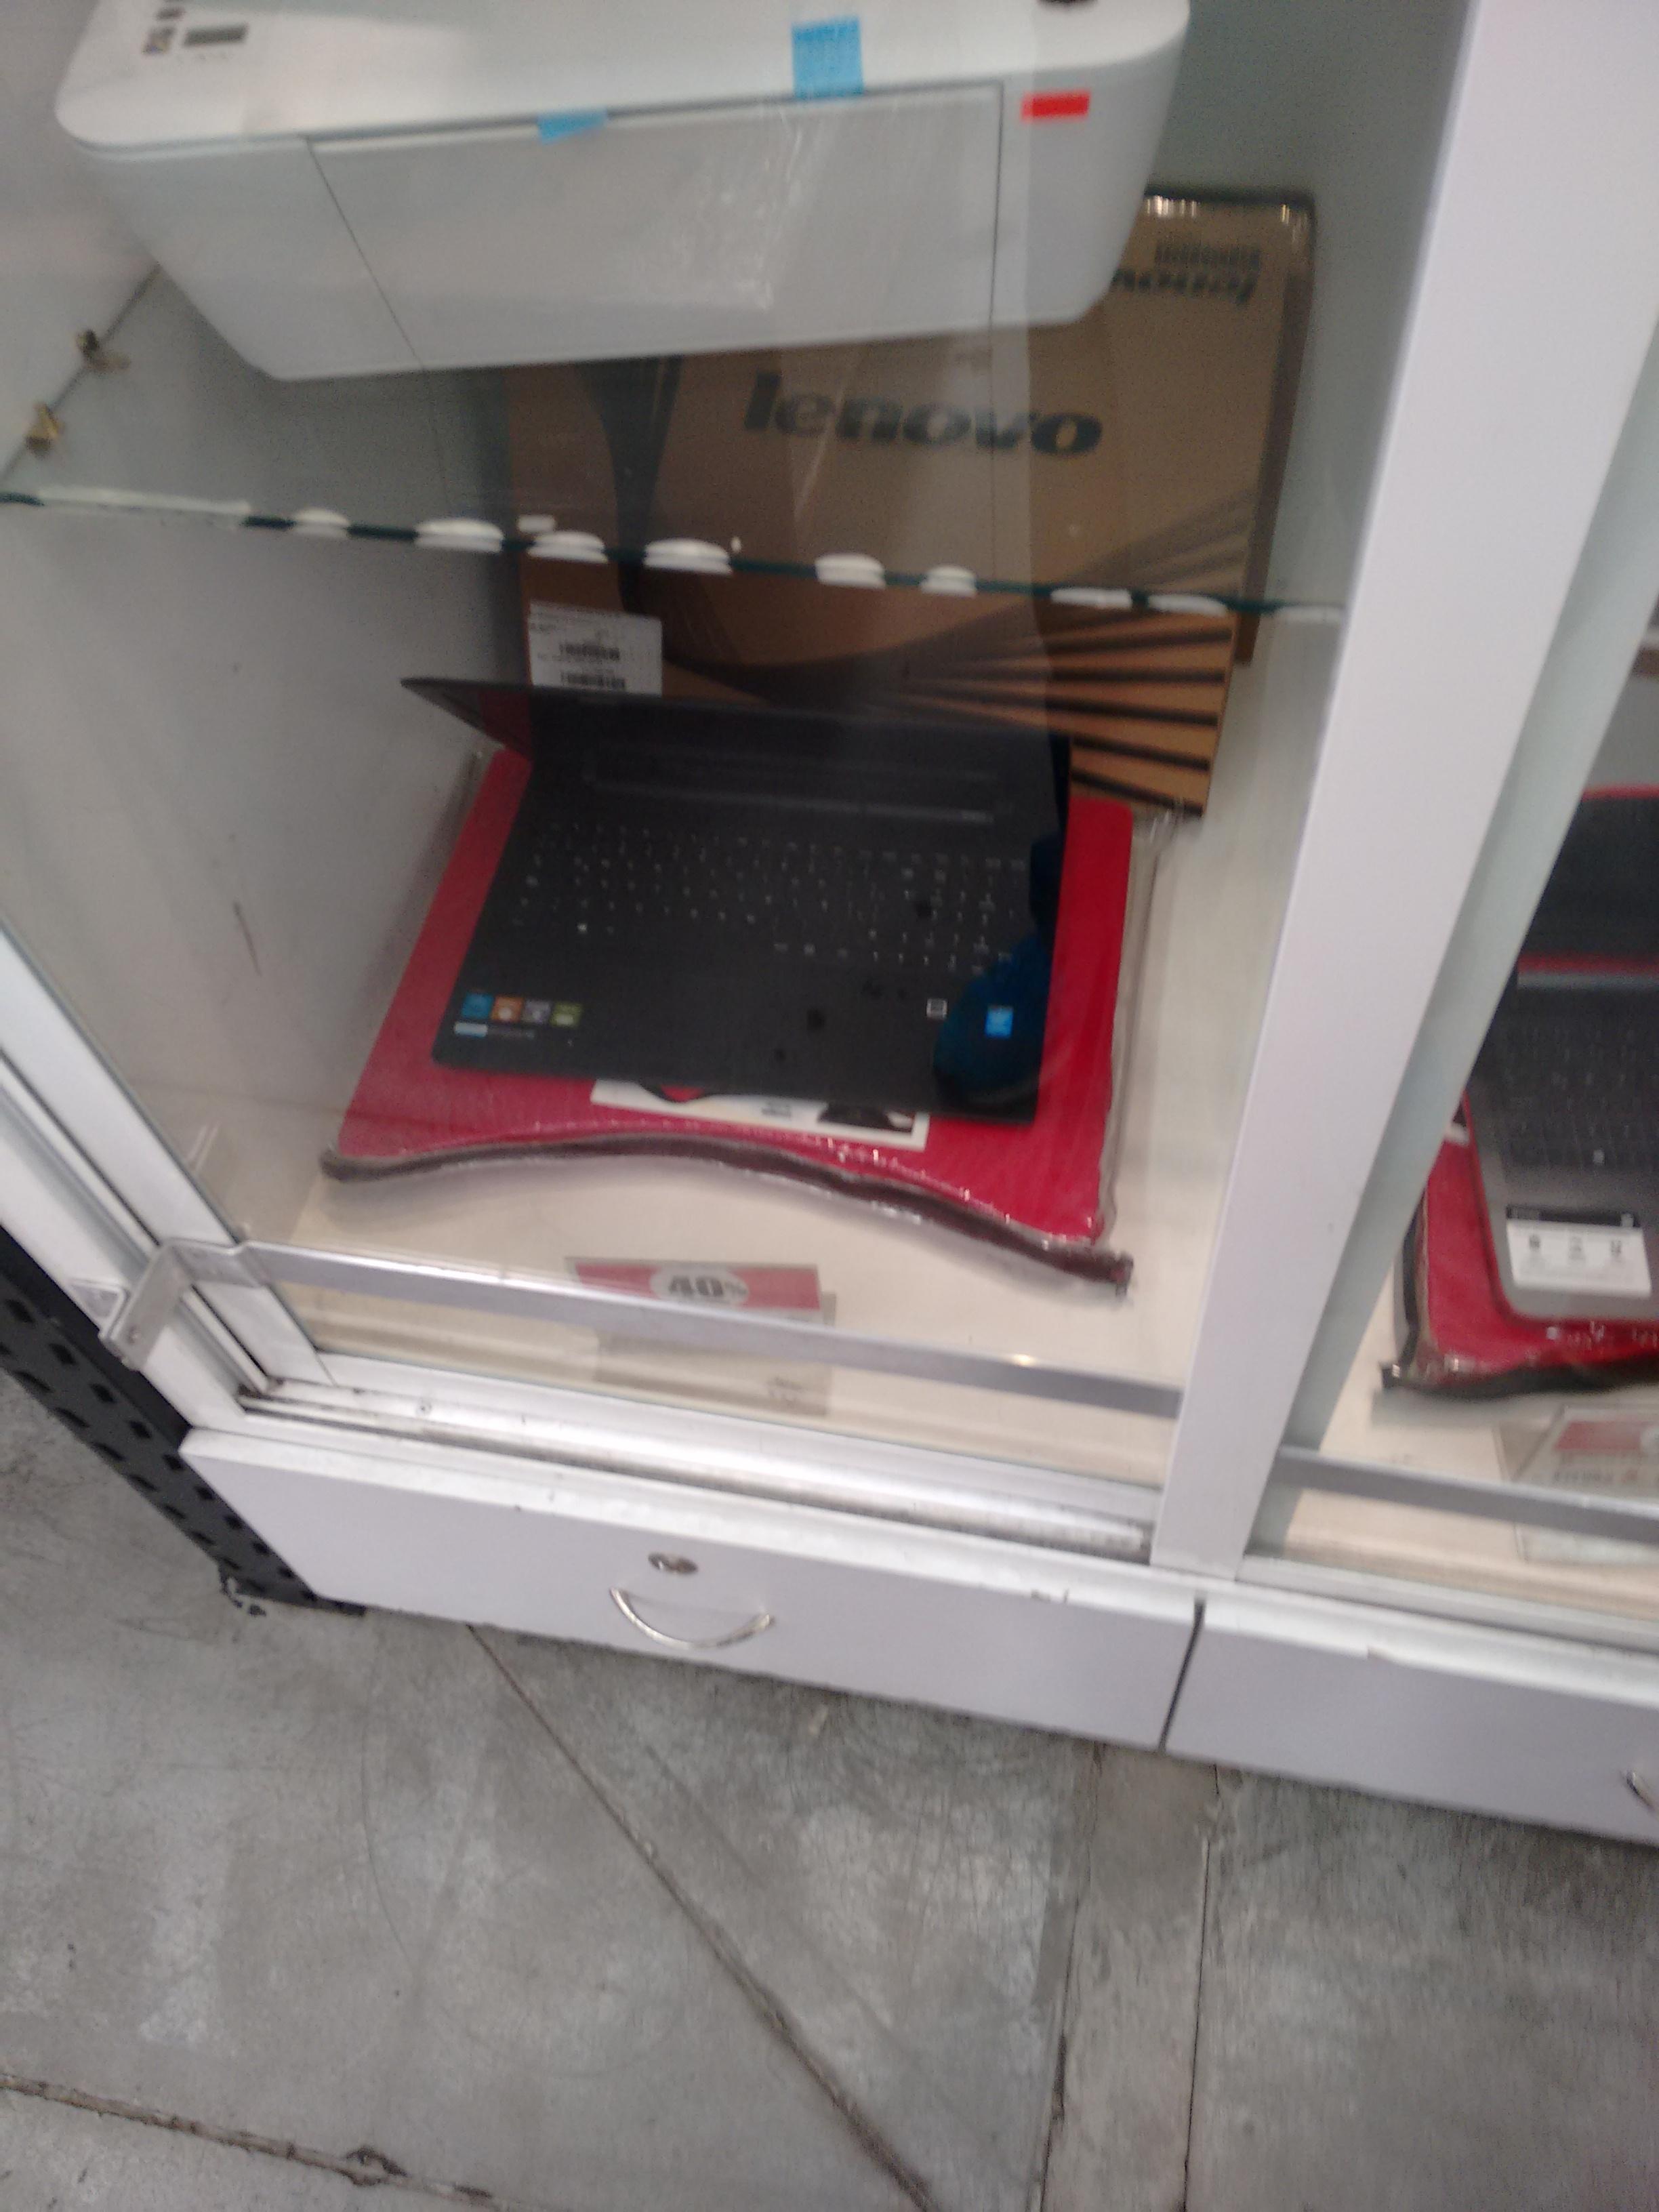 Elektra: laptop Lenovo 1TB a $4,799, audifonos Skull Candy a $97